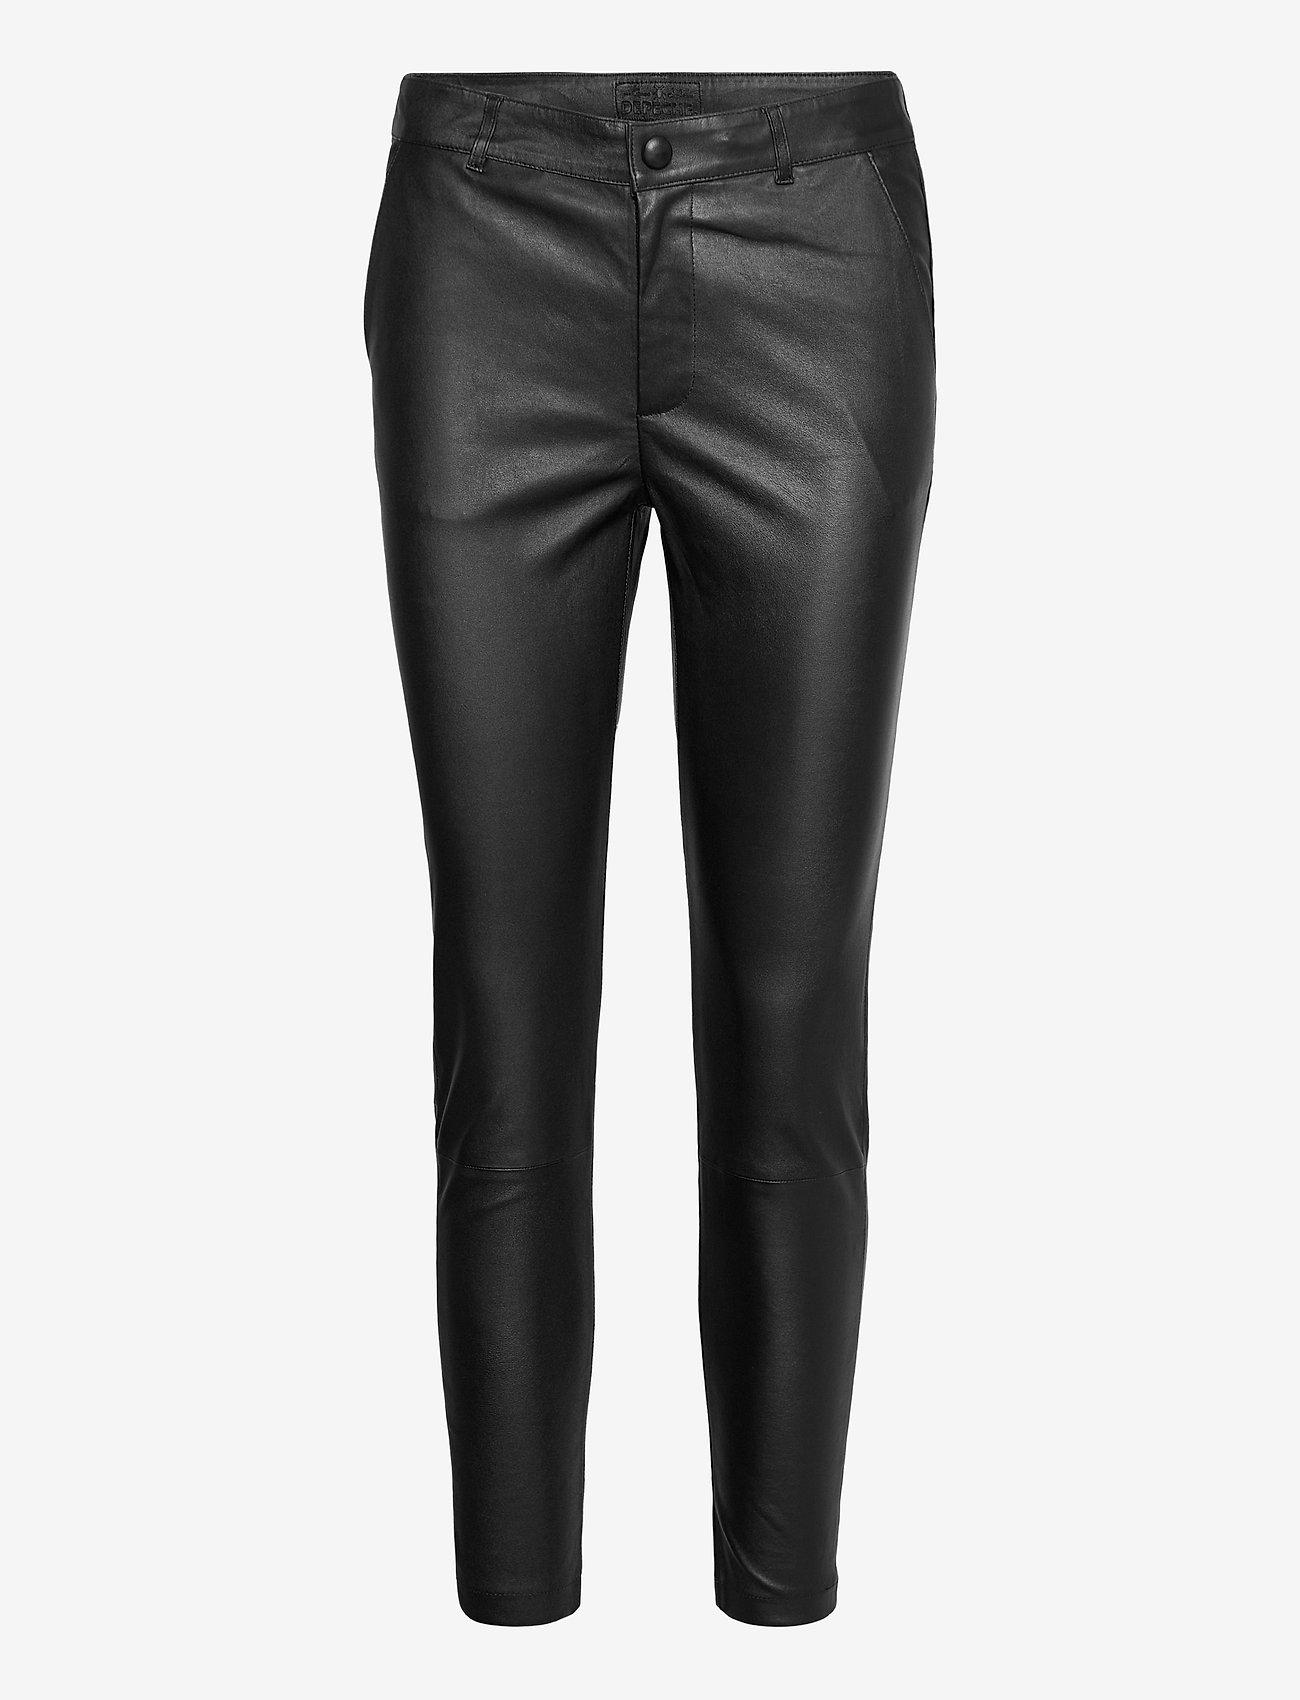 DEPECHE - Stretch pant 7/8 length - læderbukser - black - 0